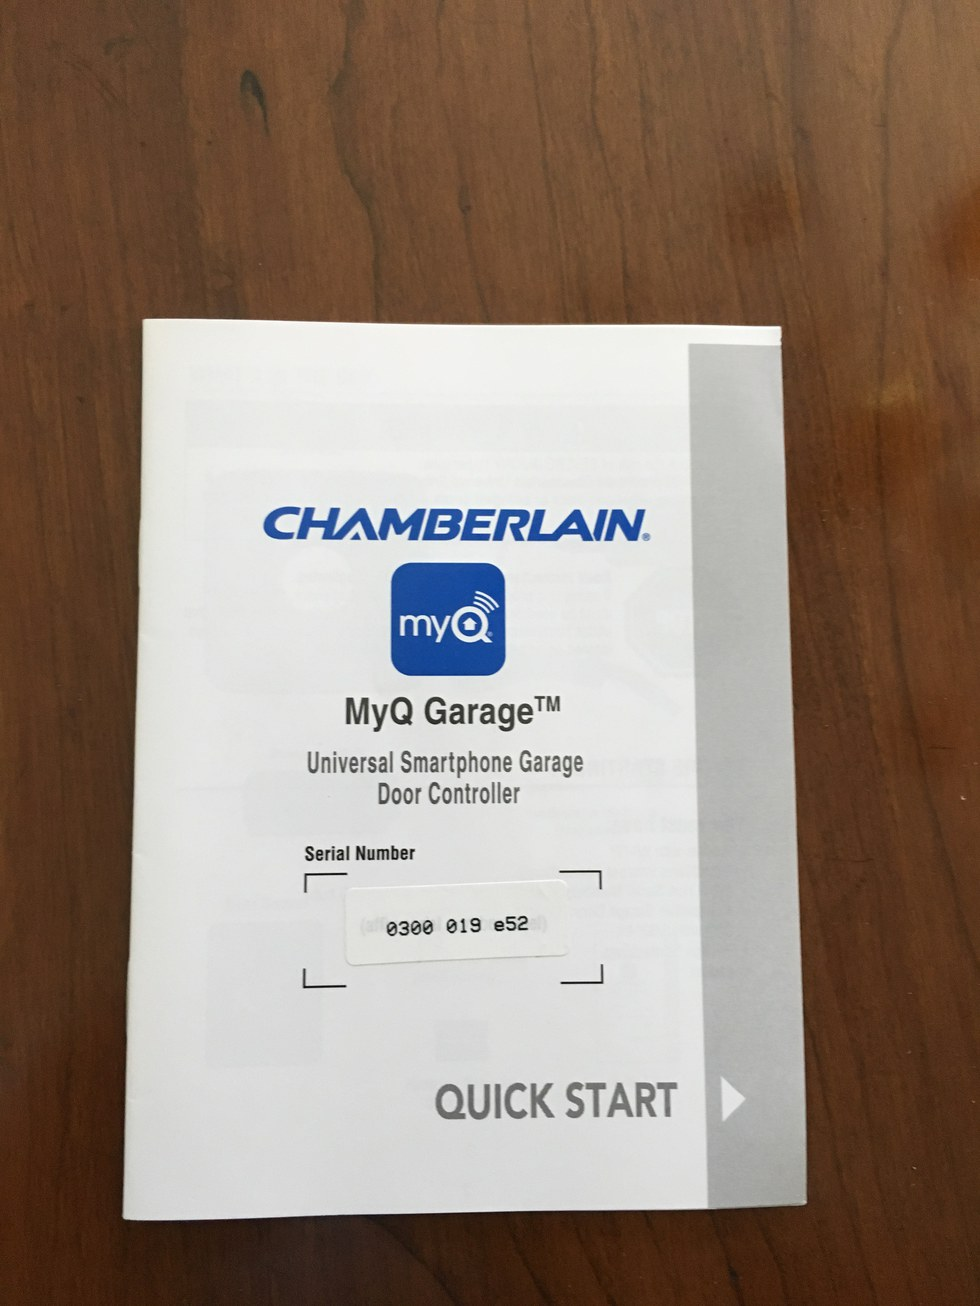 Chamberlain MyQ Garage Quick Start Guide